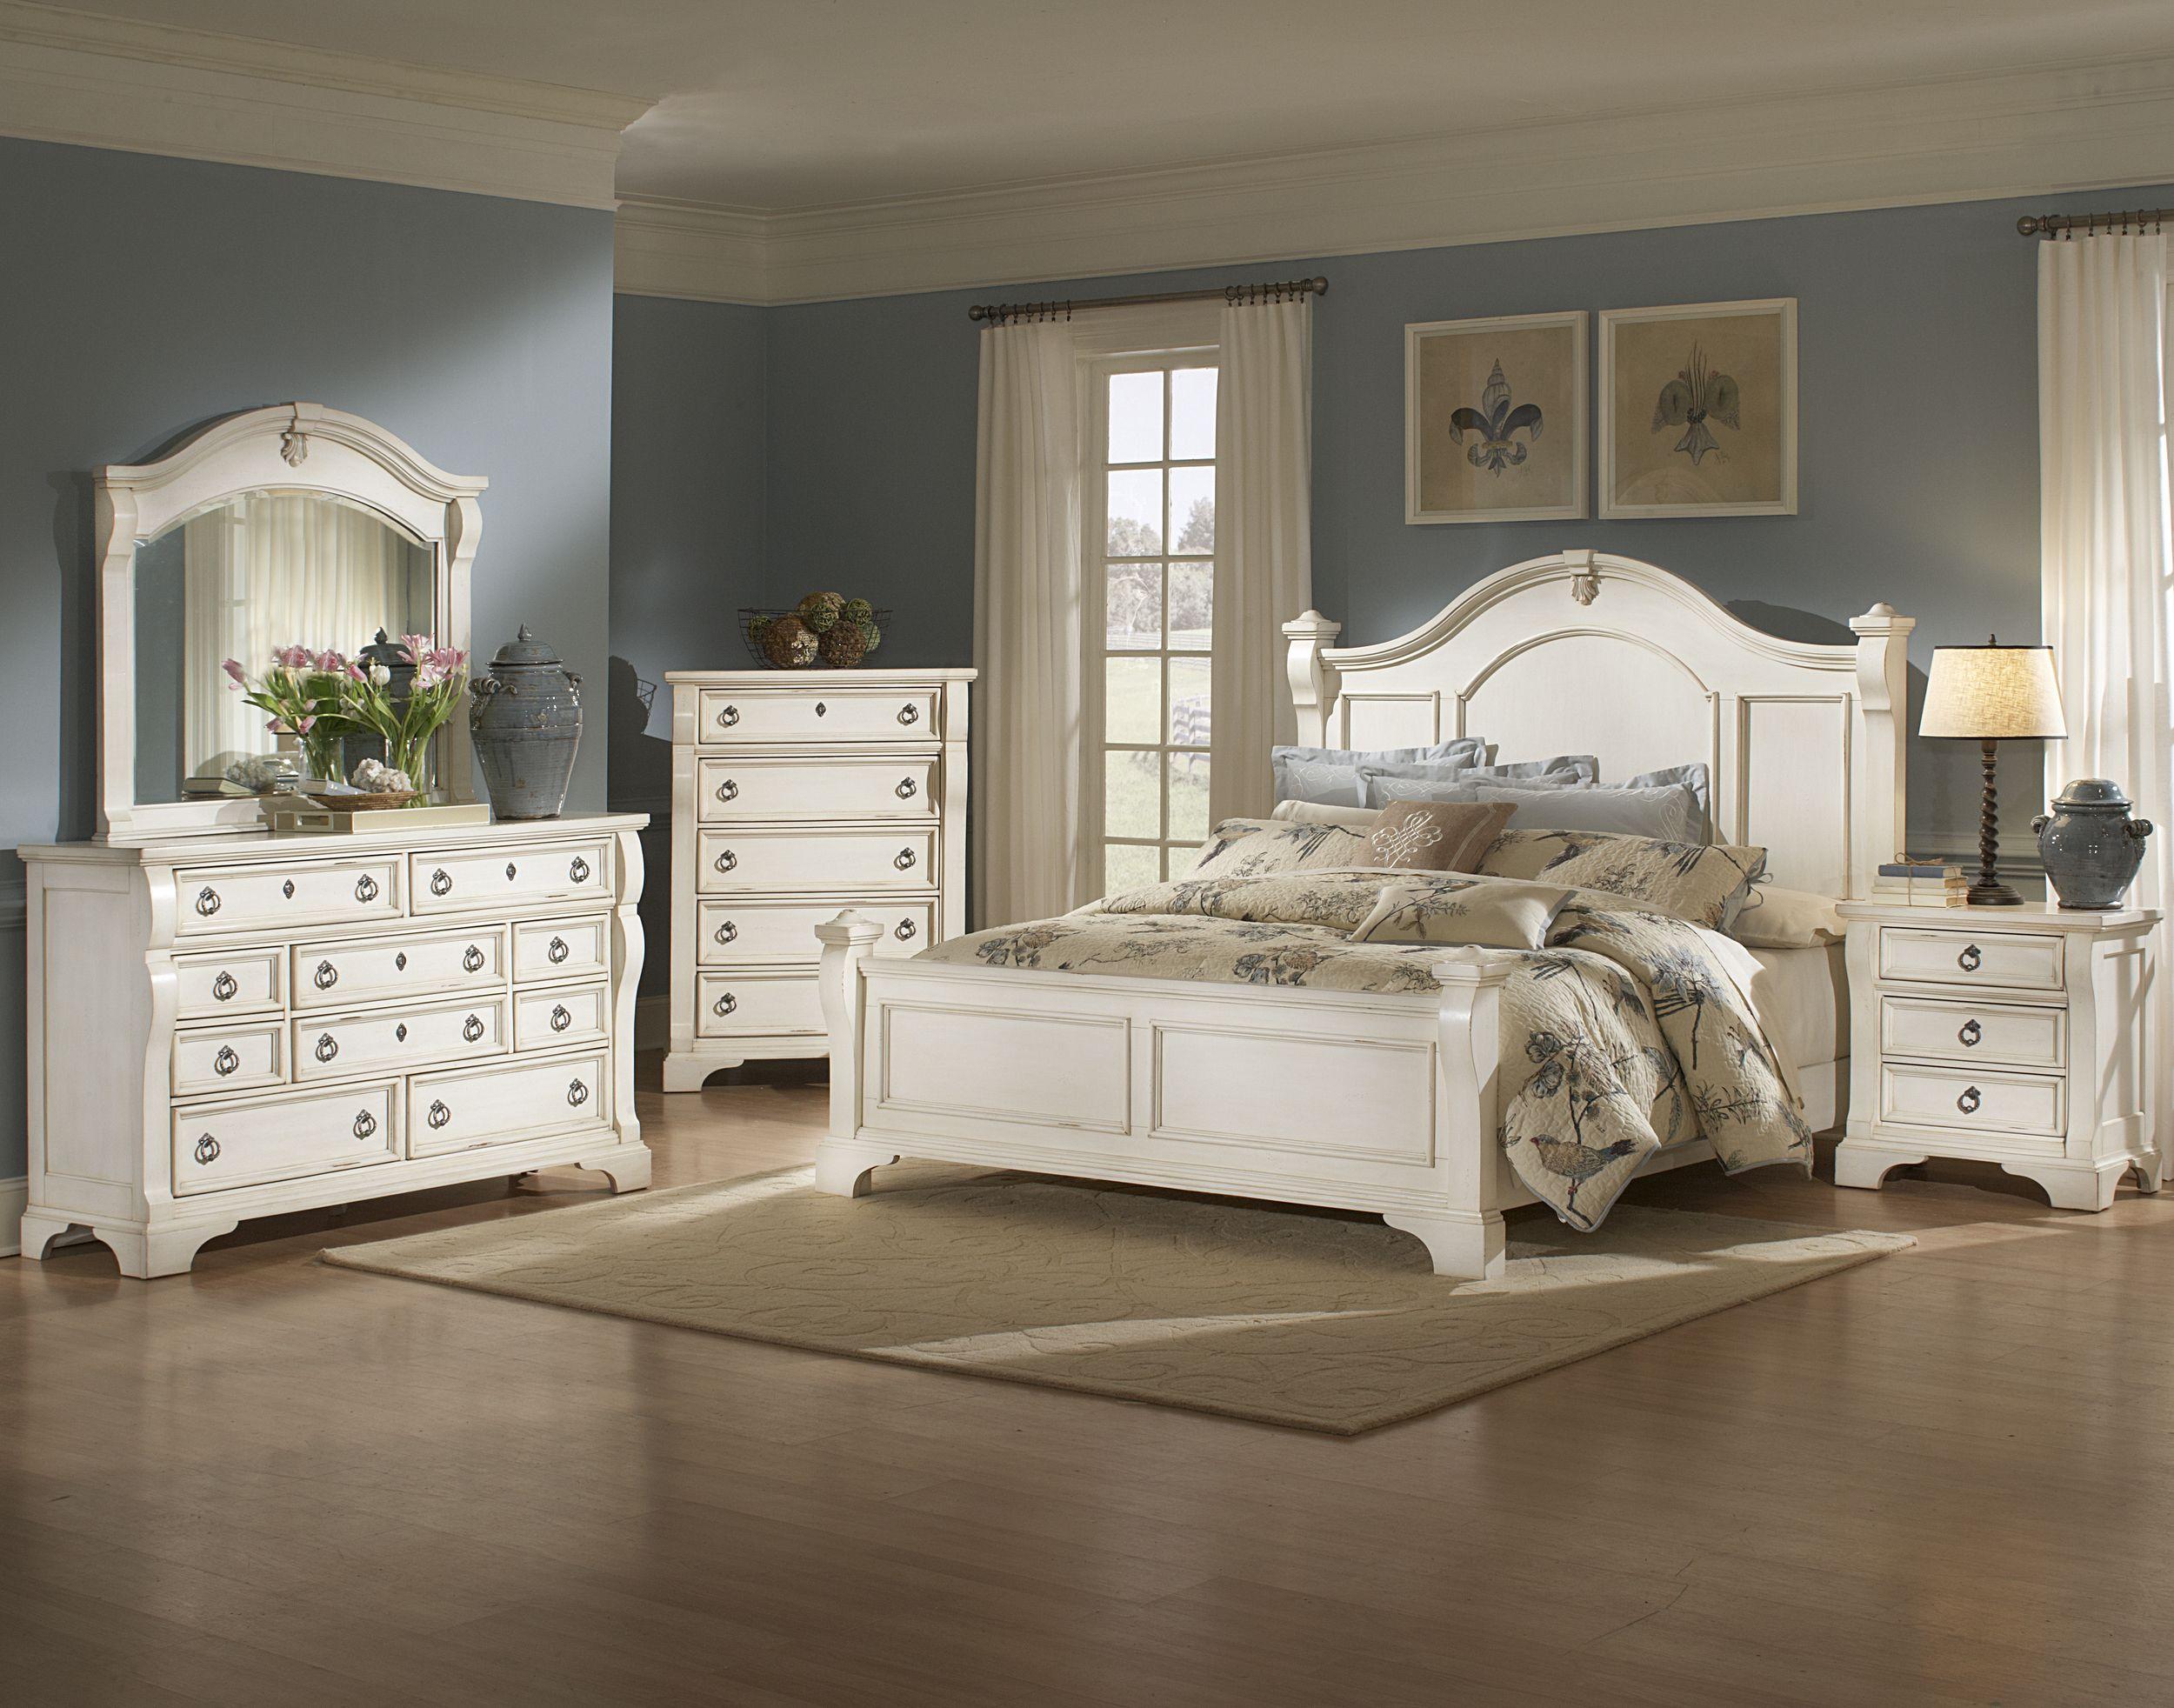 2910 961 bdrm jpg bedroom pinterest dresser bed coasters and rh pinterest com